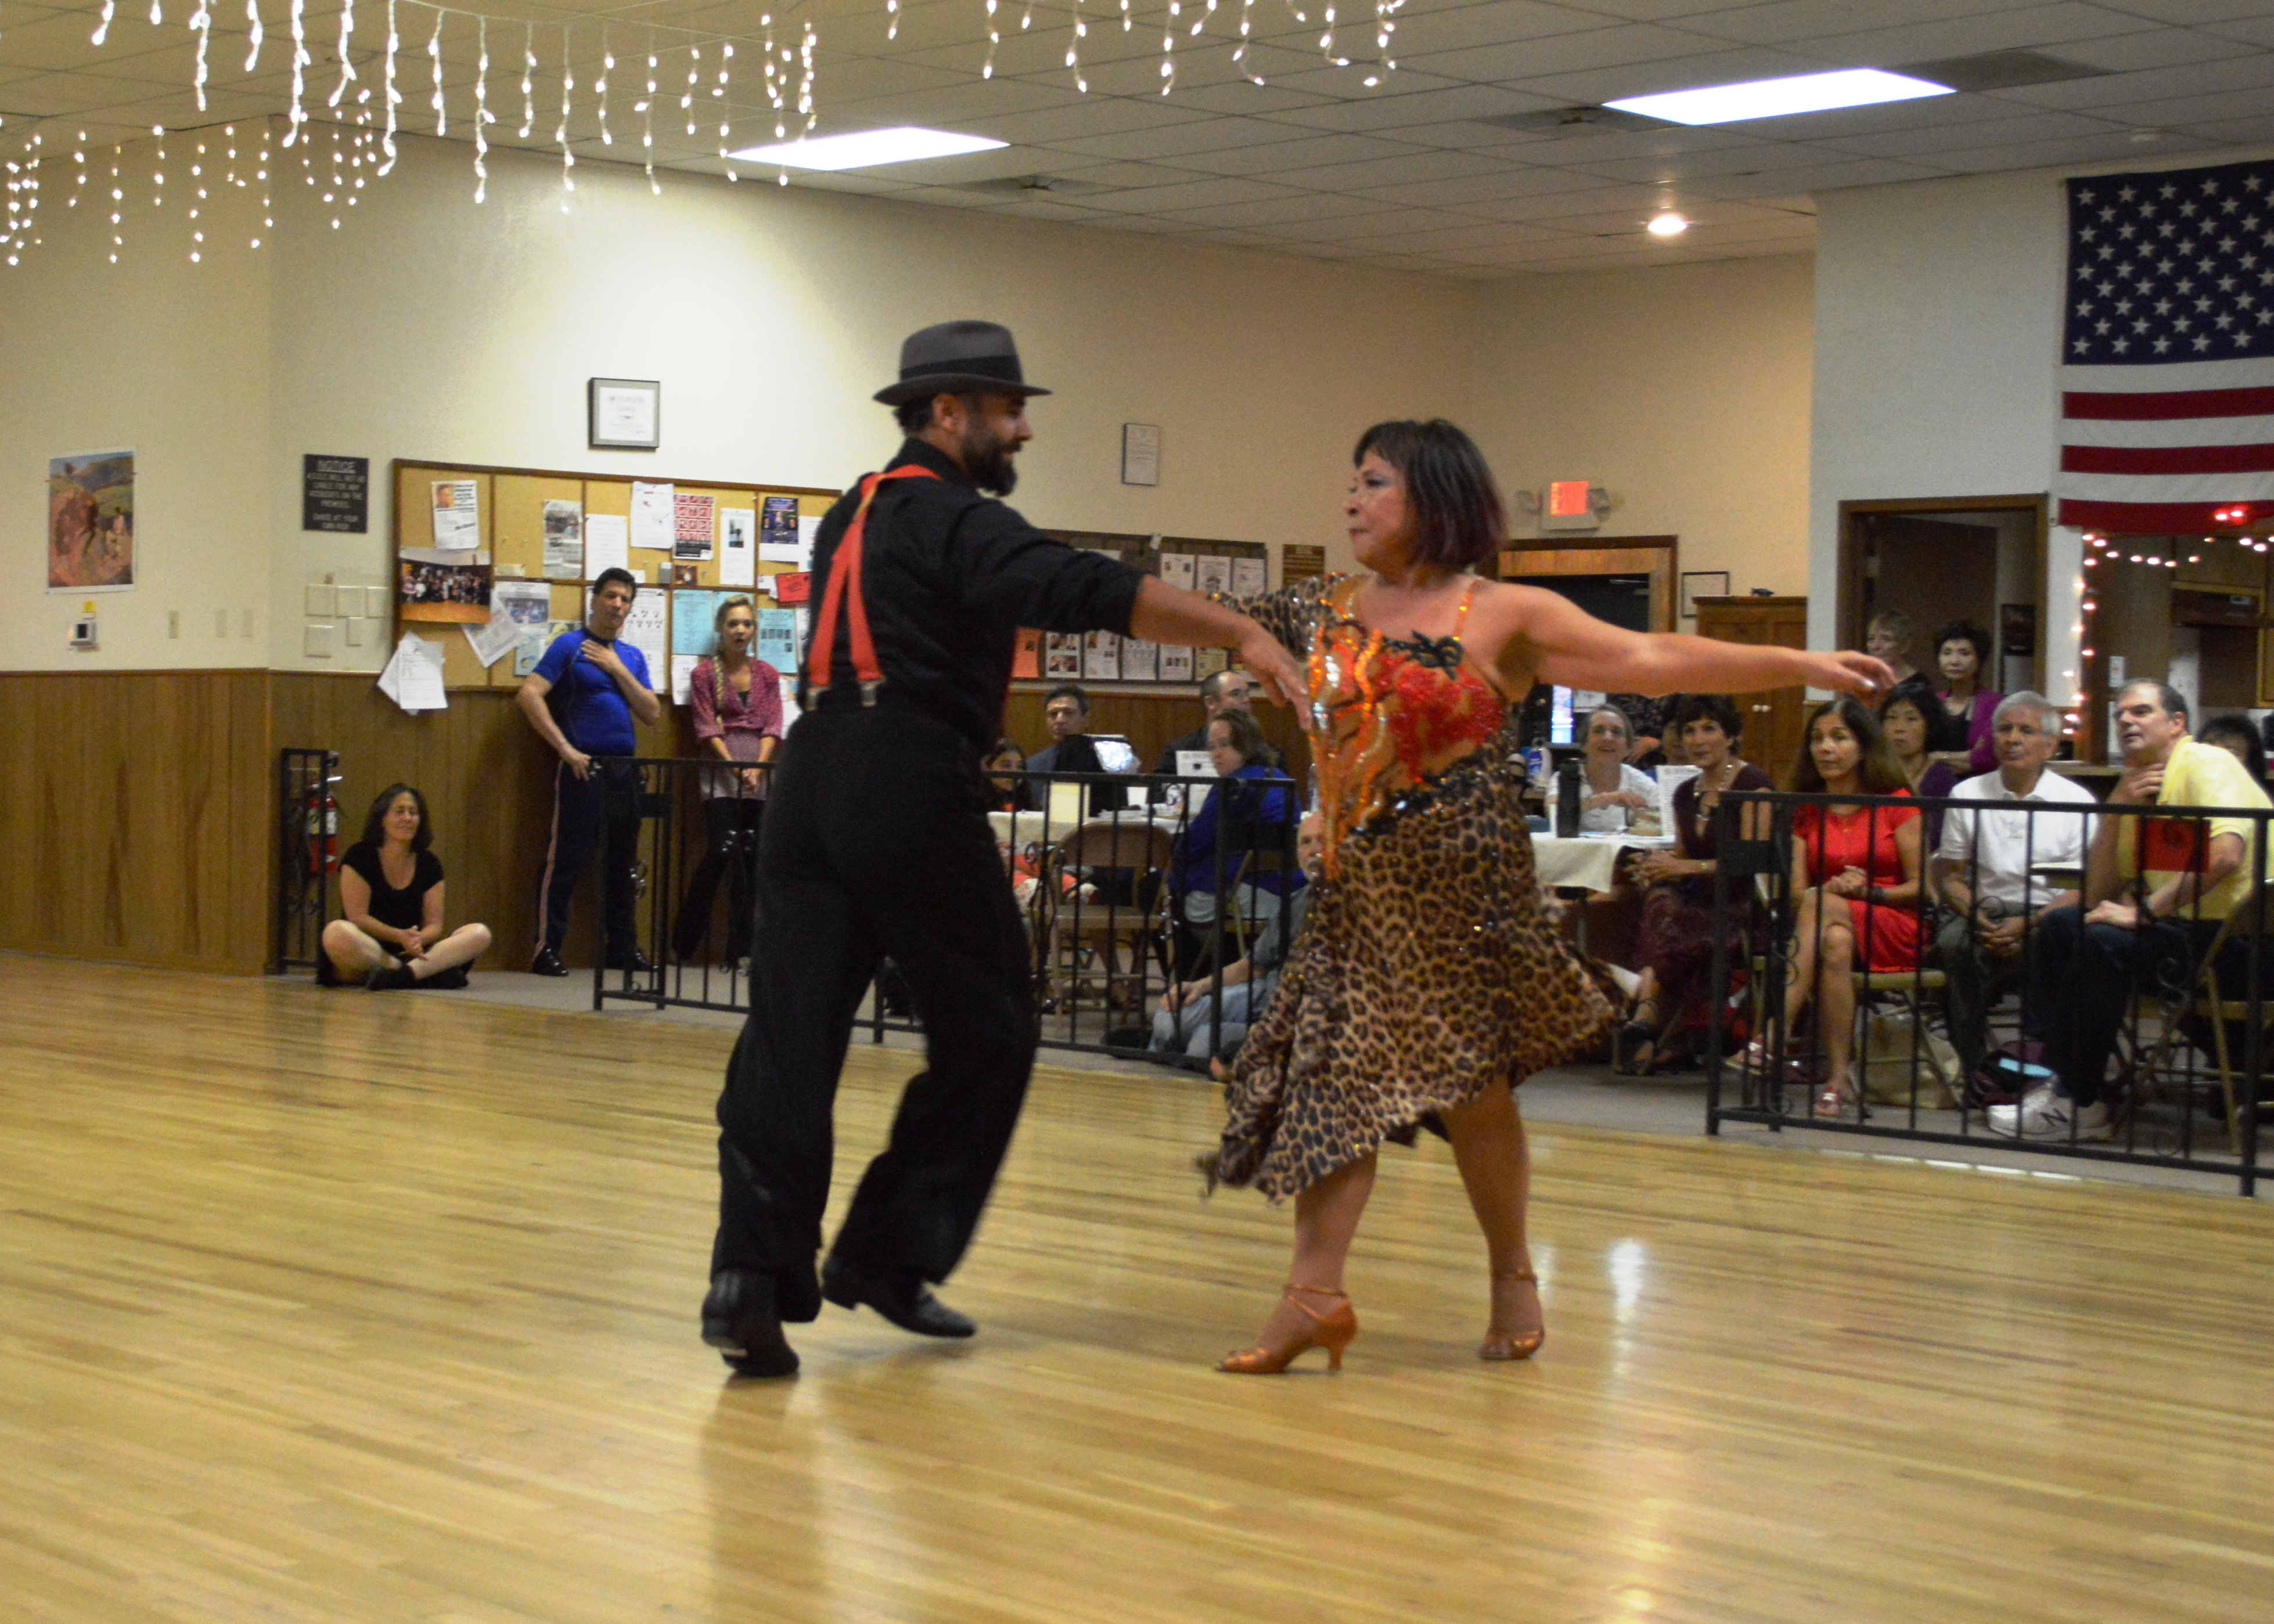 Eileen and David Dancing